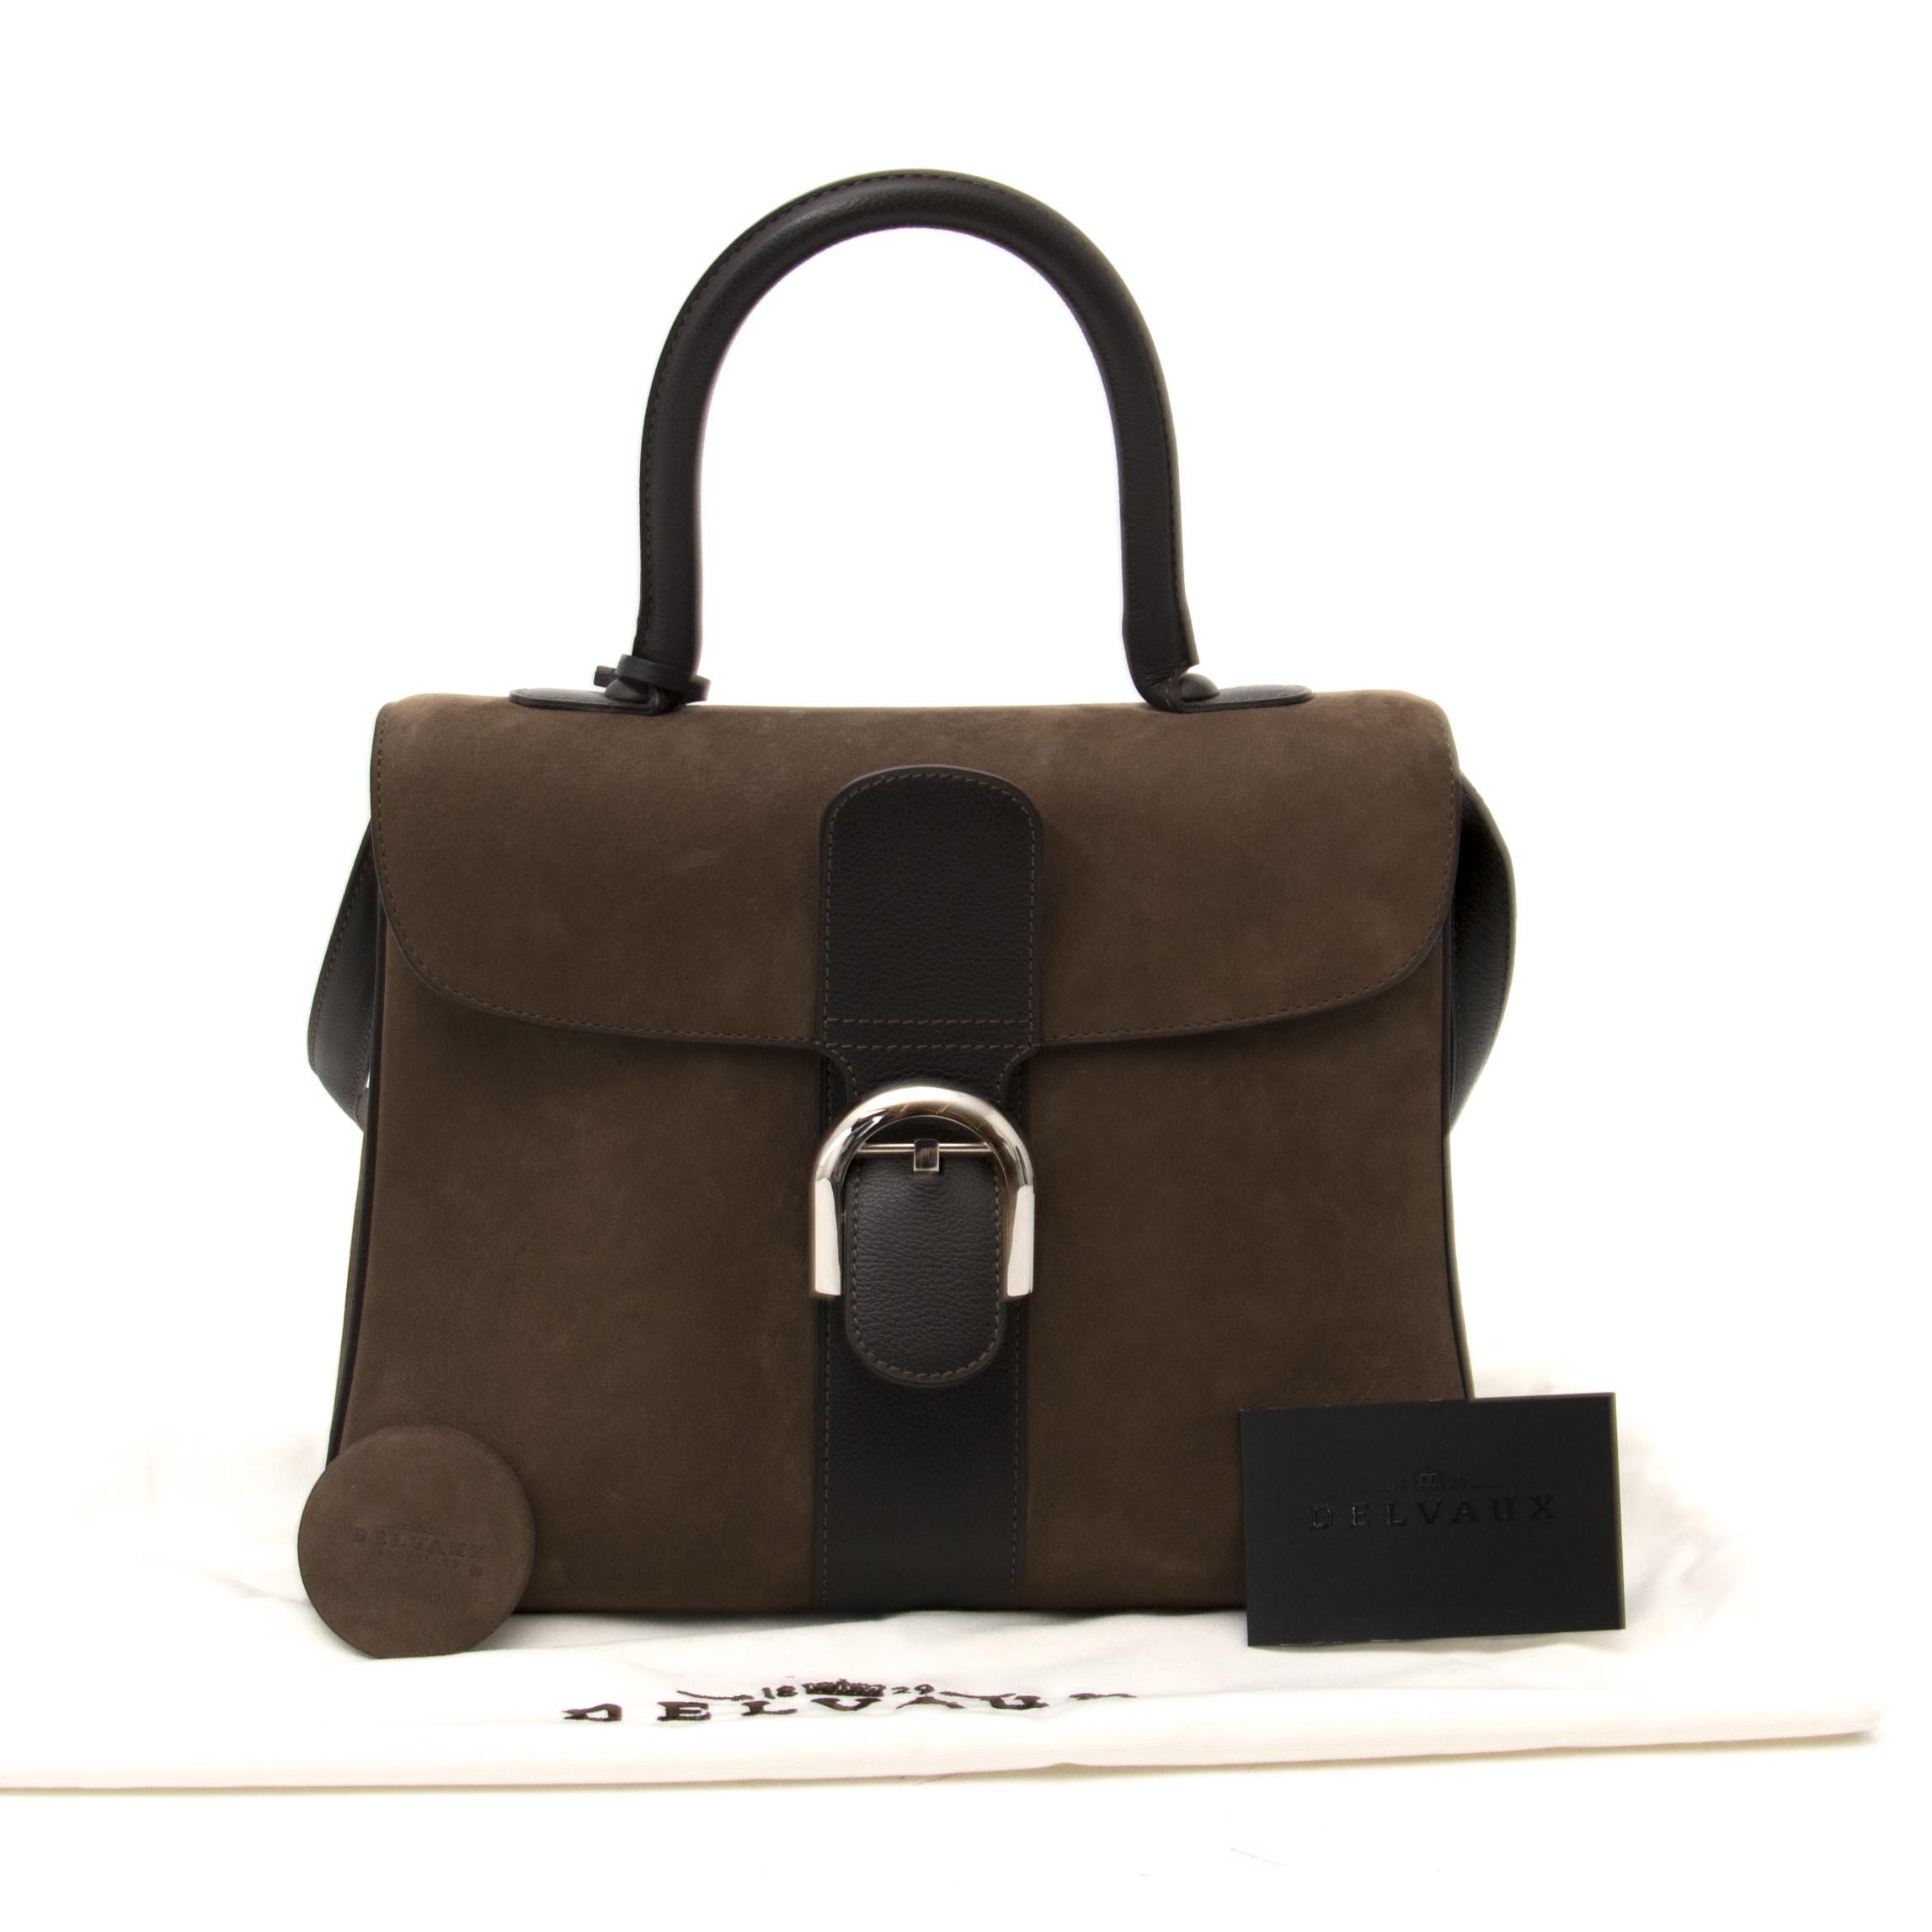 shop online aan de beste prijs shop safe Delvaux Brown Bicolor Brillant MM + Strap online at the best price